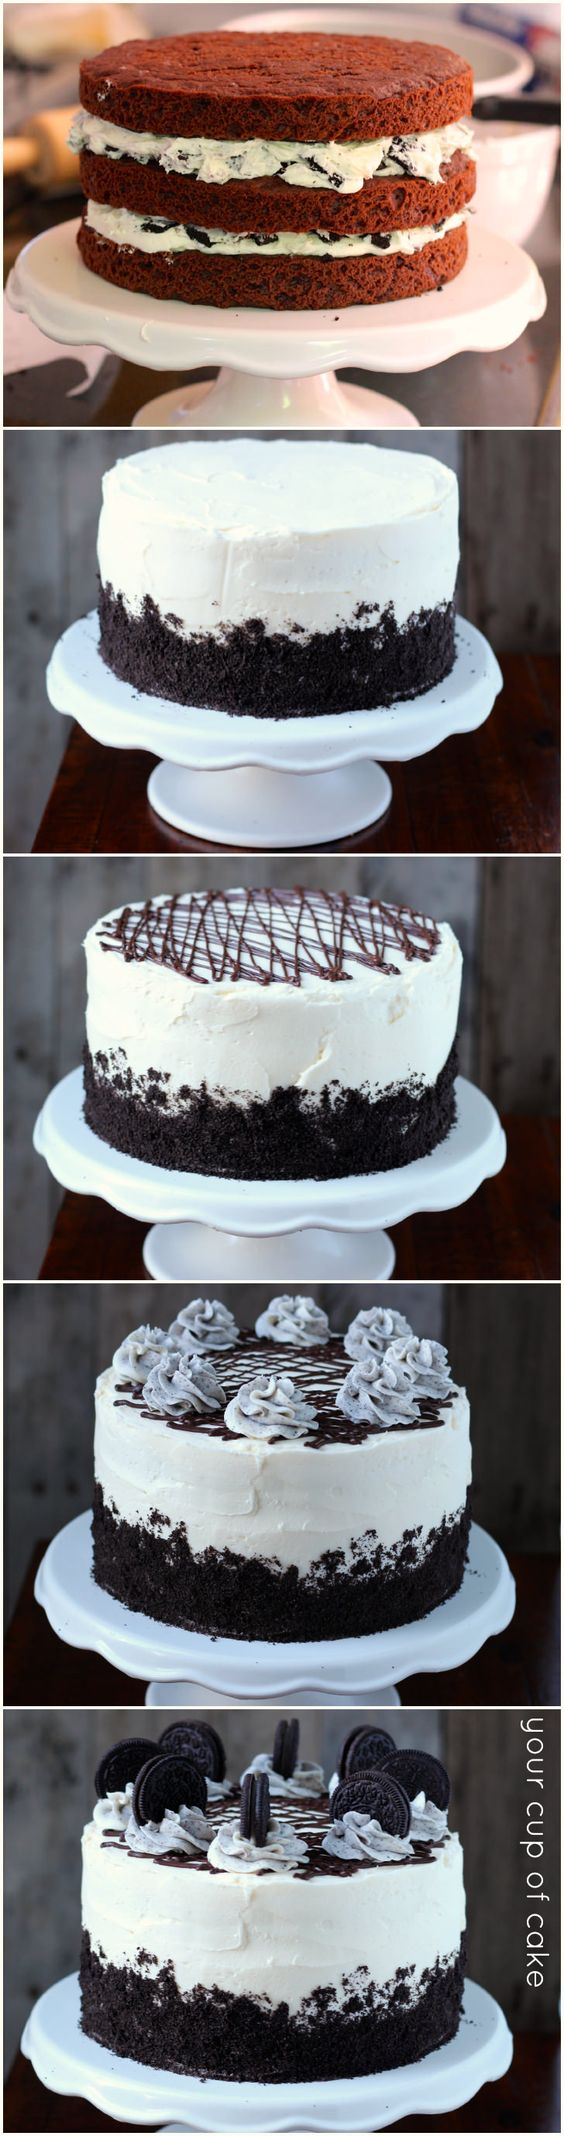 How to make an Oreo Cake. AMYYYYY!! @huebnamy @am